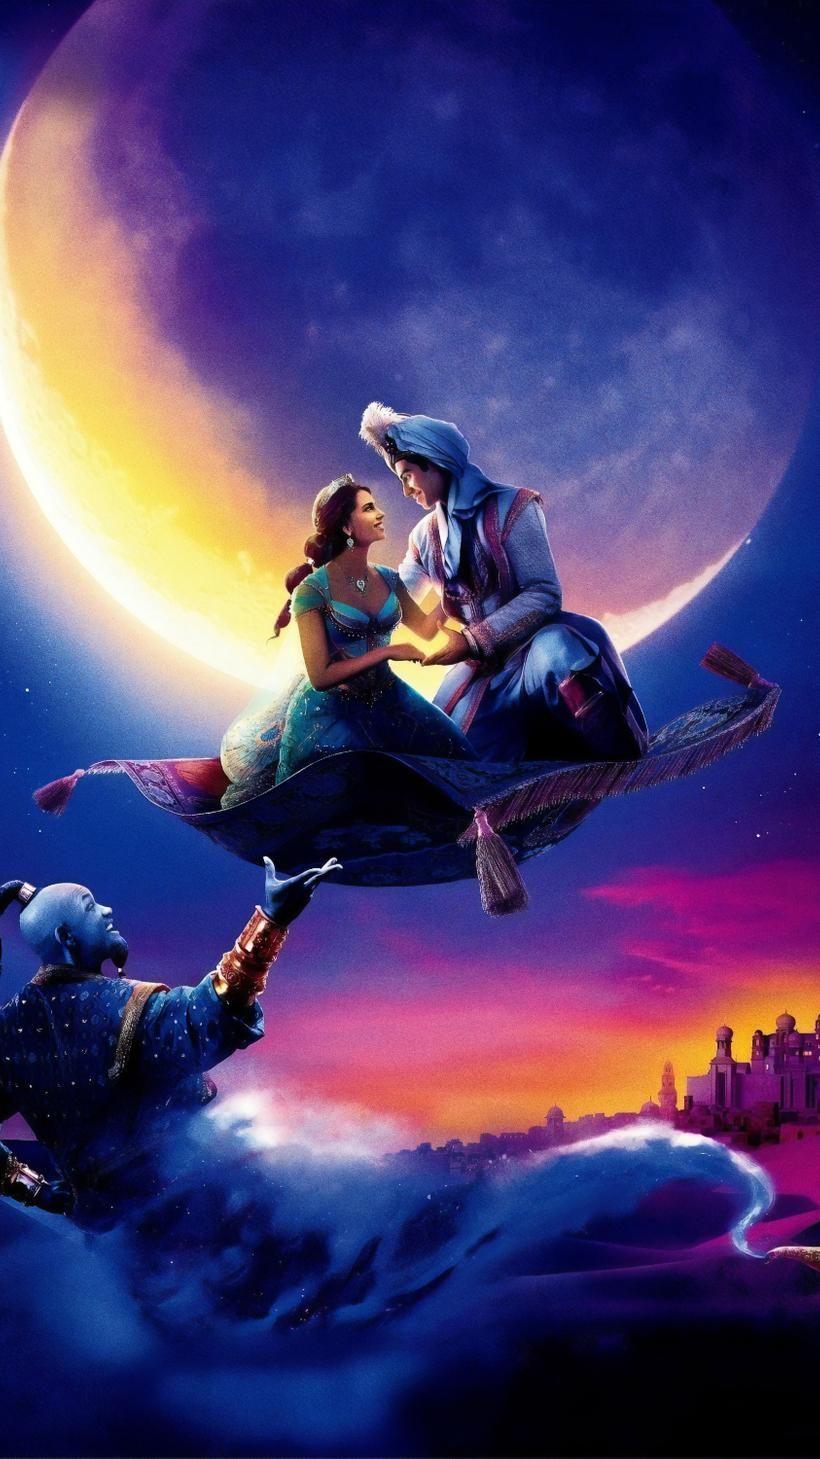 Aladdin 2019 Phone Wallpaper Moviemania 디즈니 배경 알라딘